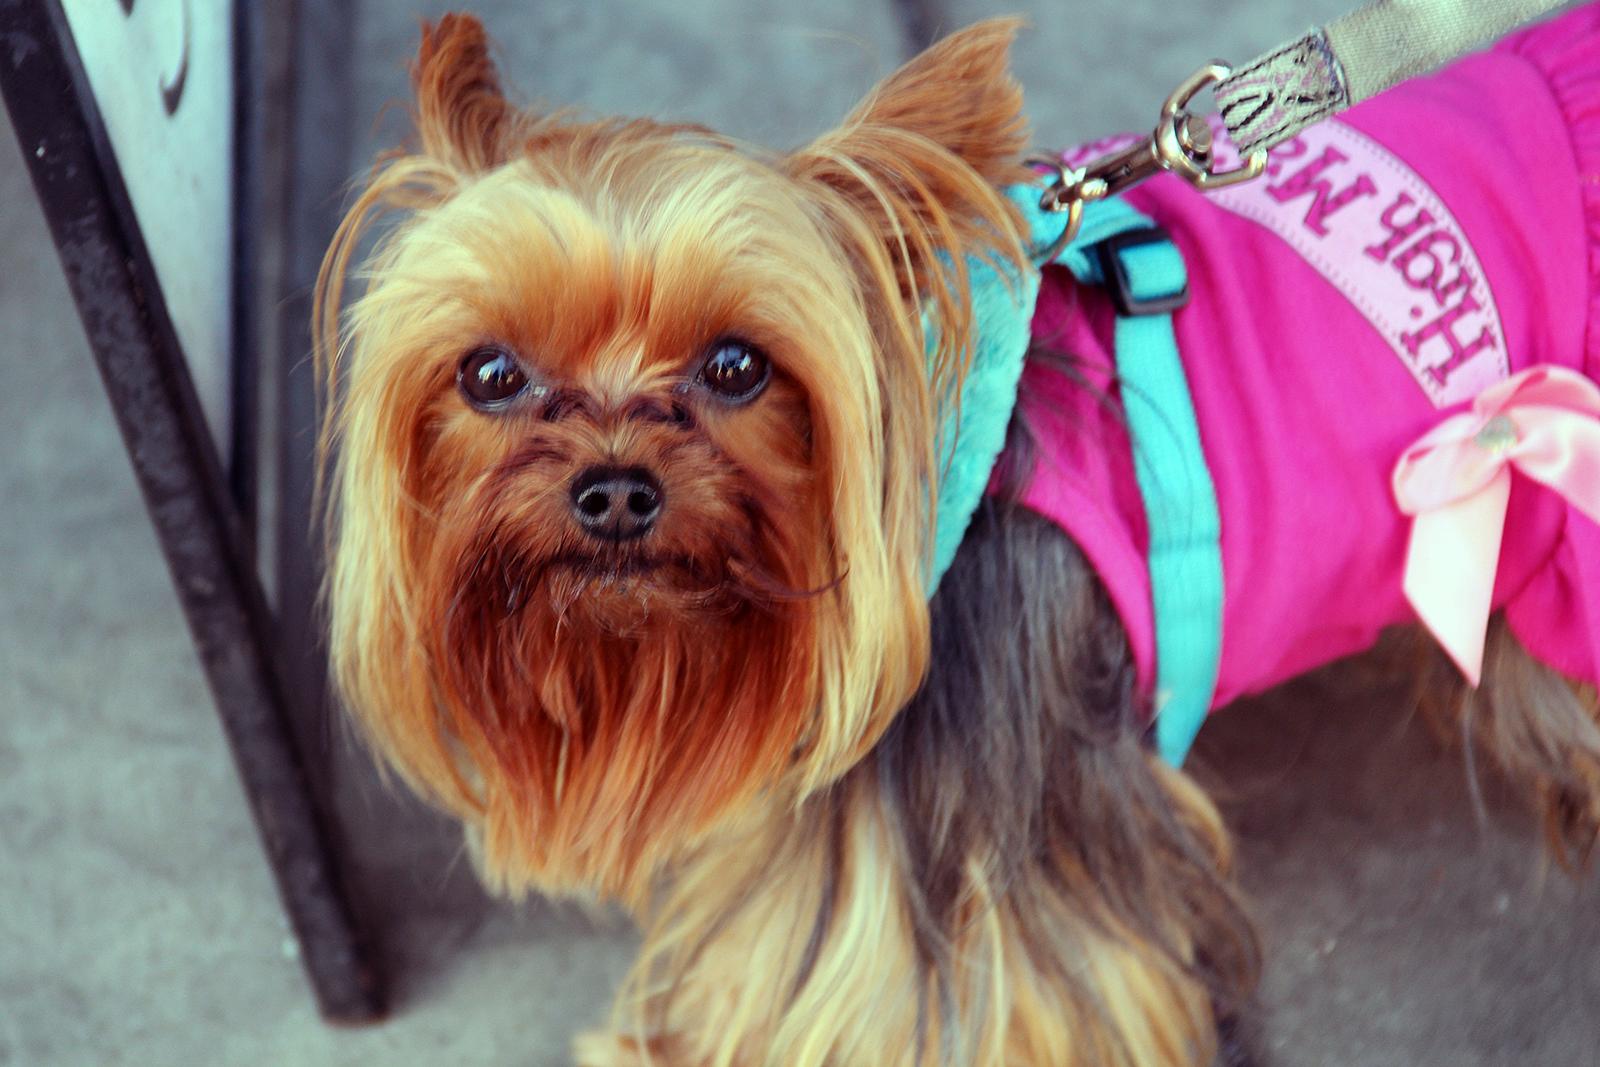 A dog on Mission Street.